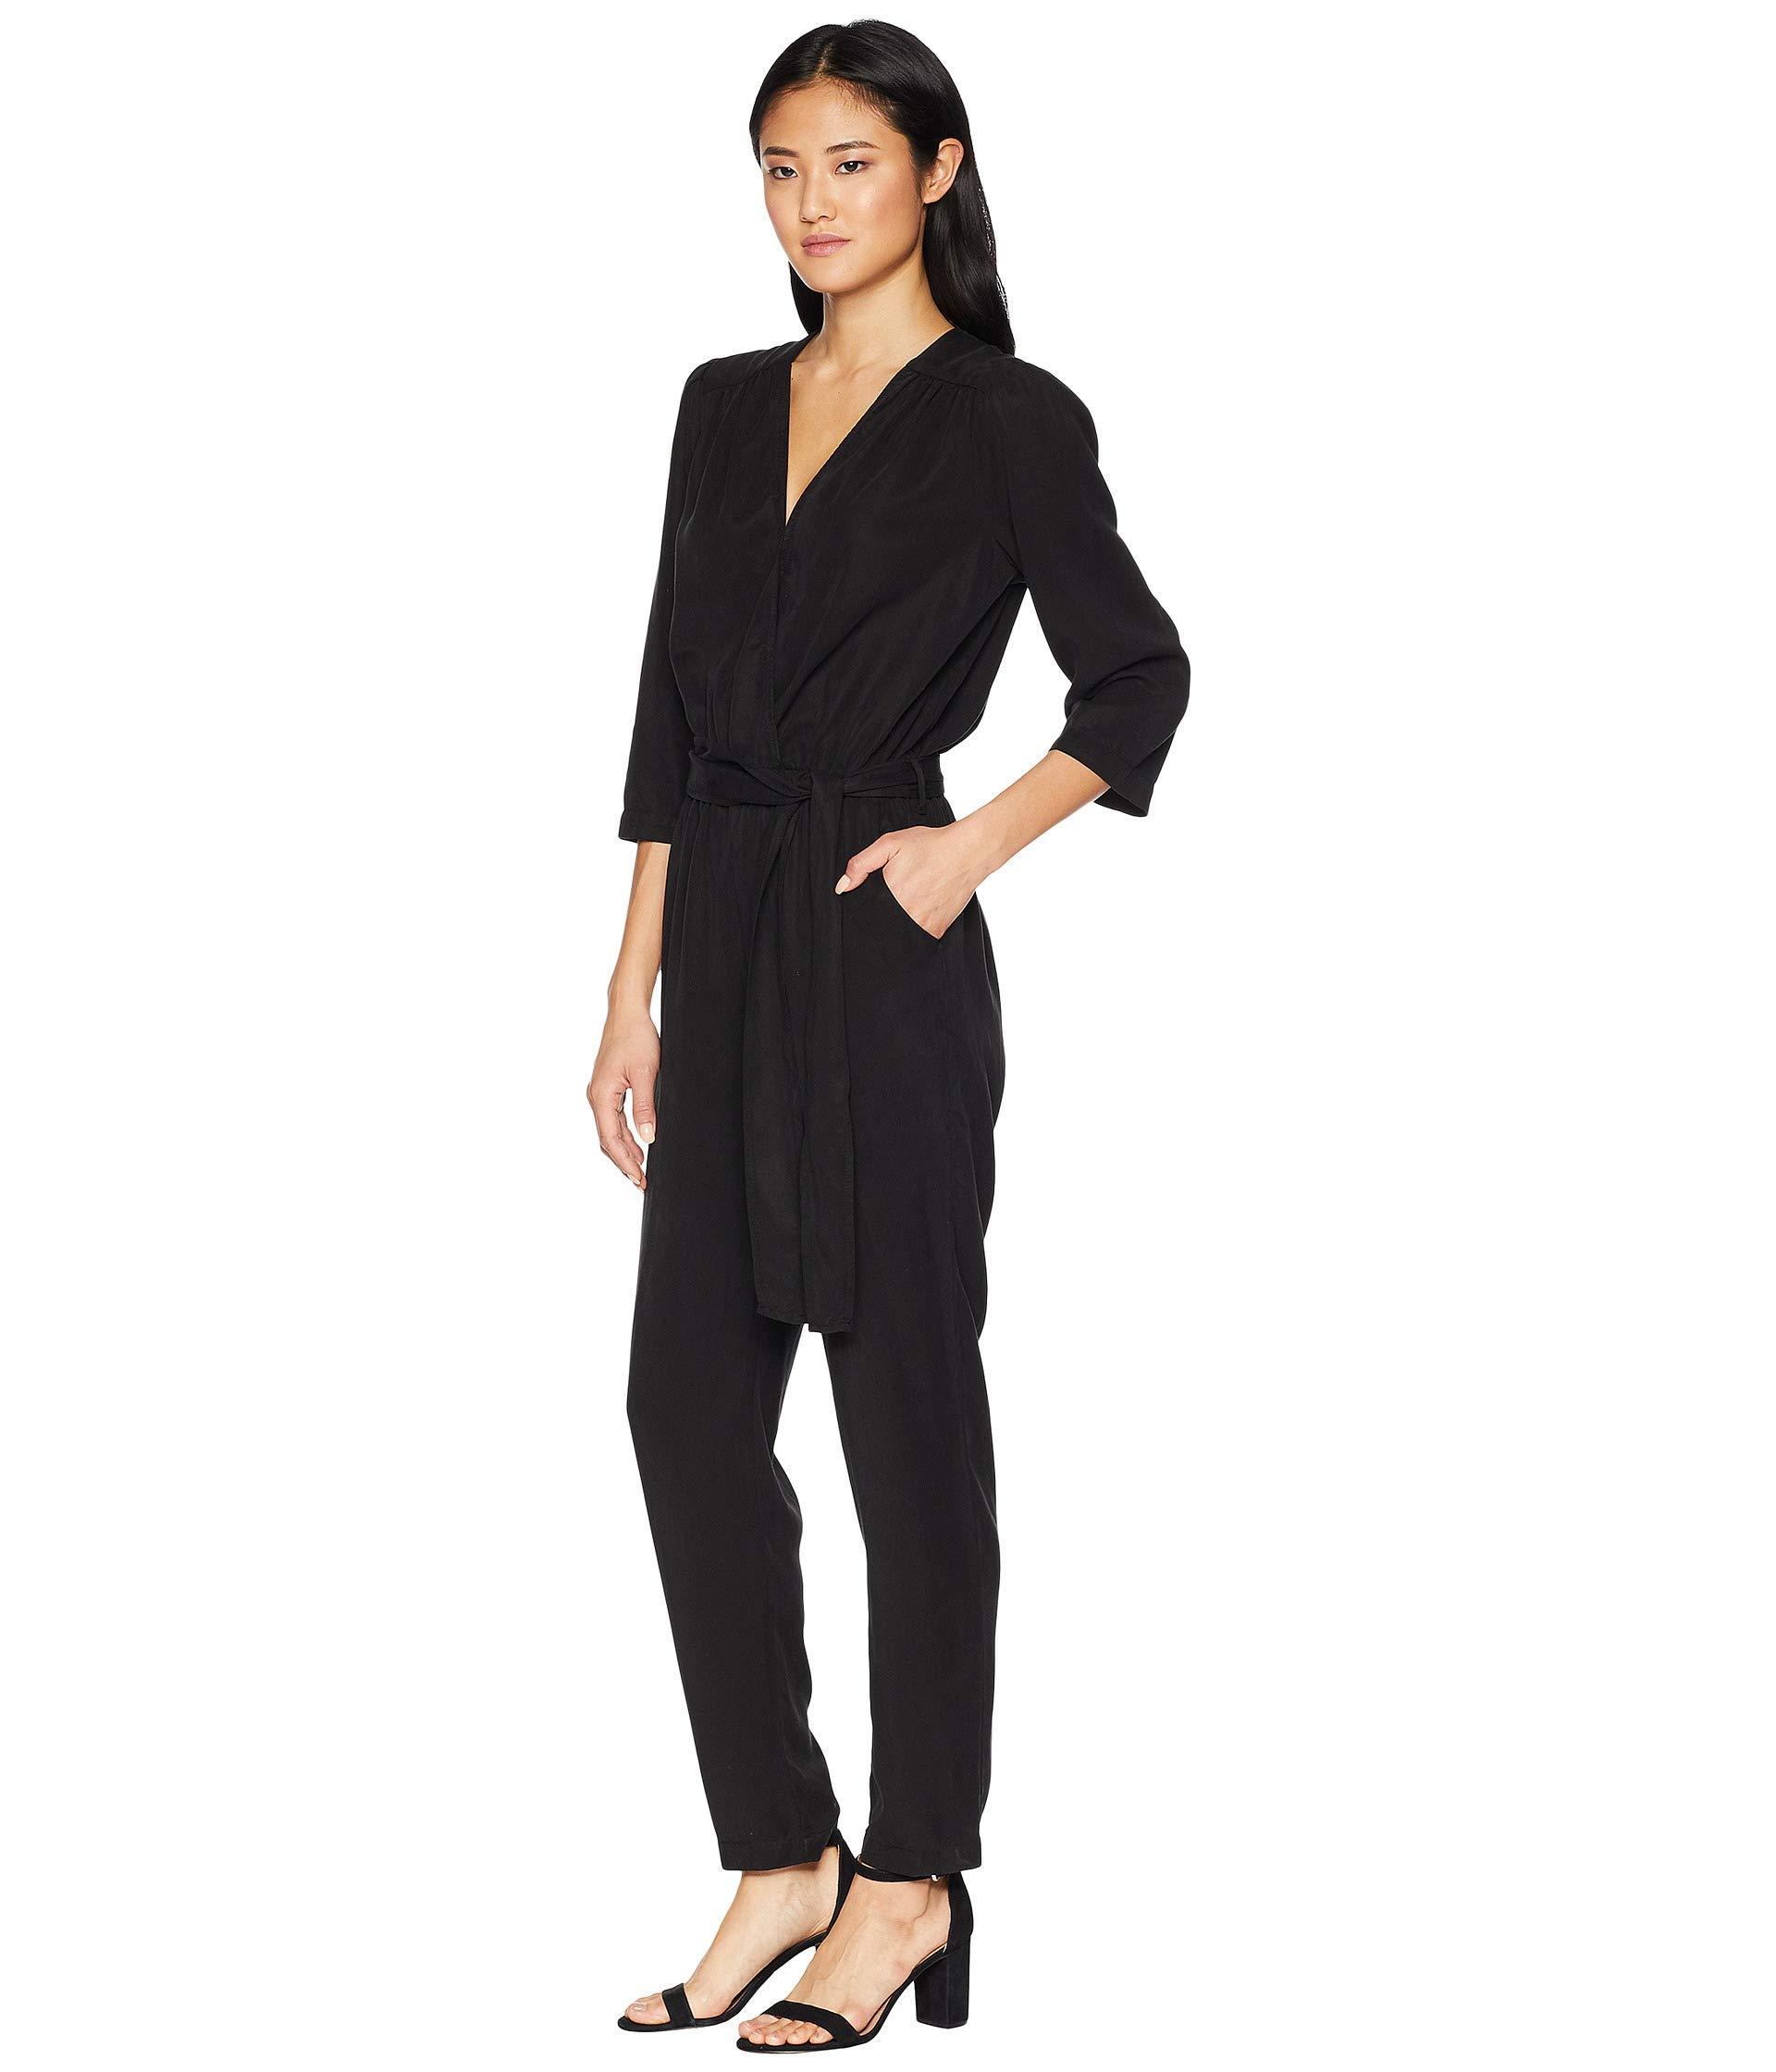 086df52ddd24 Lyst - Young Fabulous   Broke Bellows Jumpsuit in Black